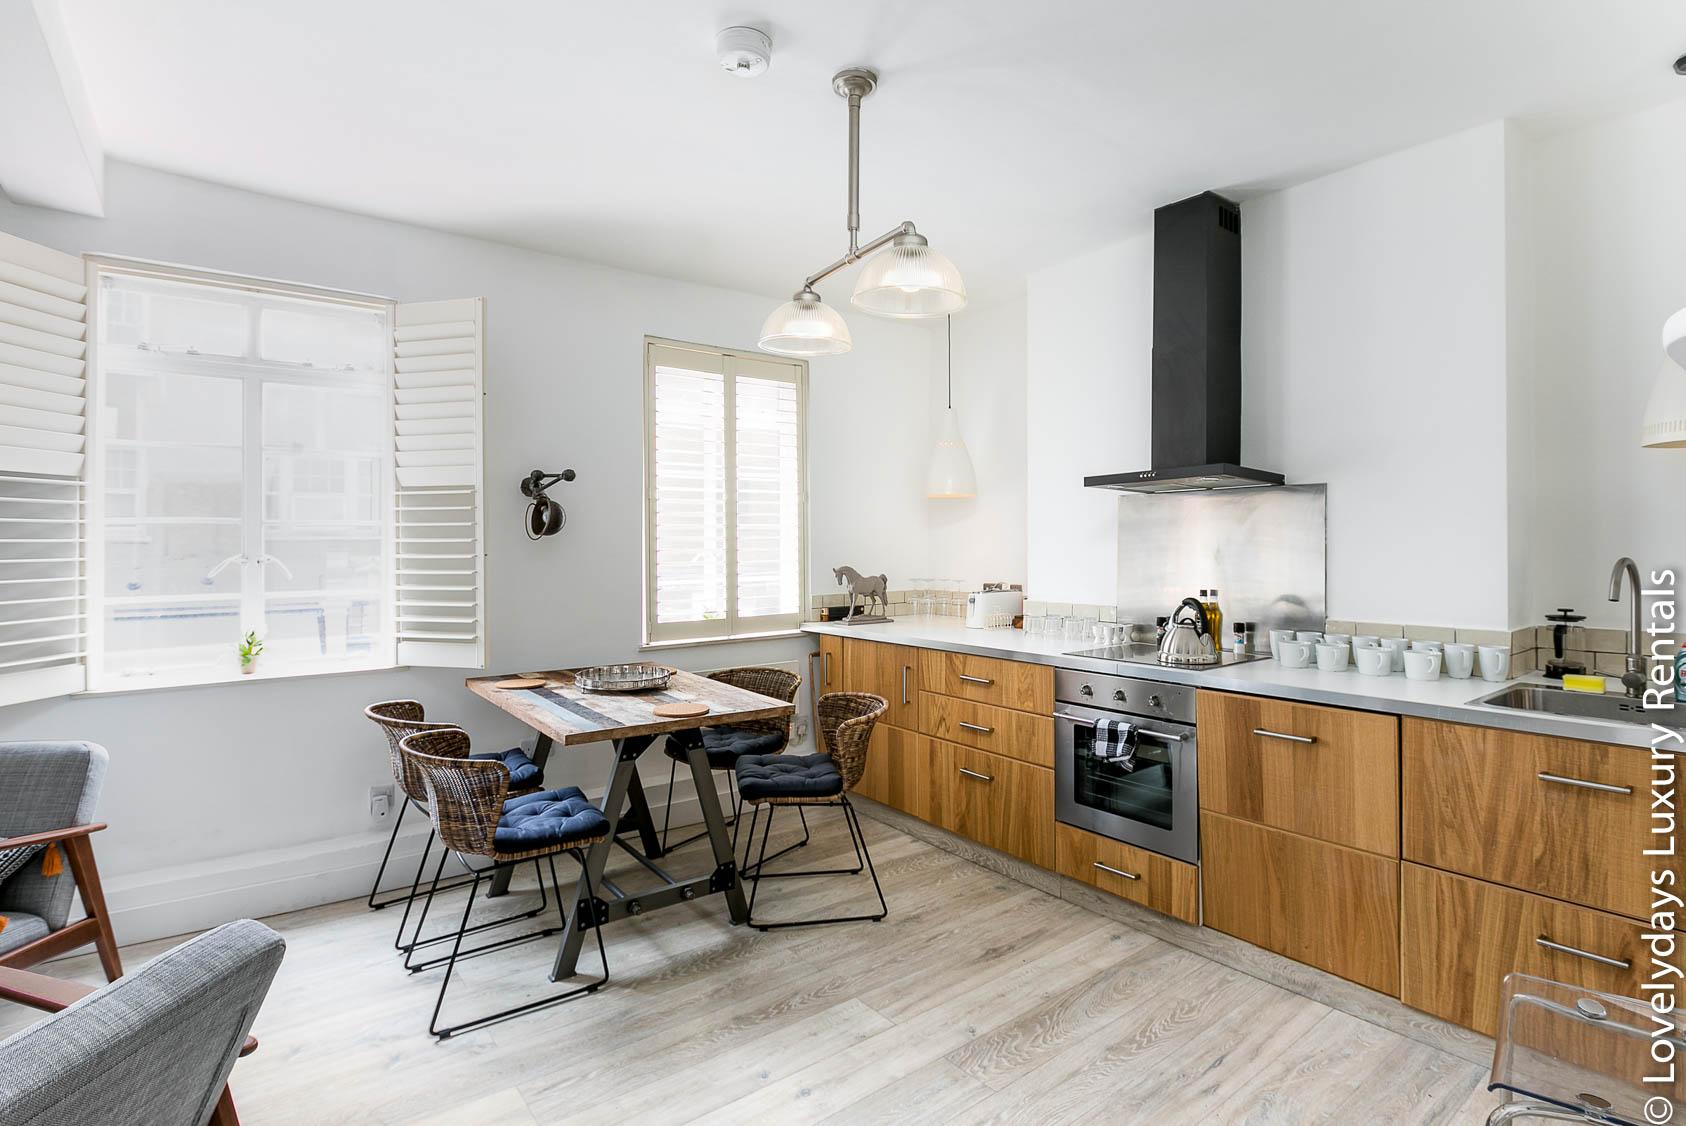 Lovelydays luxury service apartment rental - London - Fitzrovia - Goodge 55 - Lovelysuite - 2 bedrooms - 3 bathrooms - Luxury kitchen - eac5c828fea0 - Lovelydays